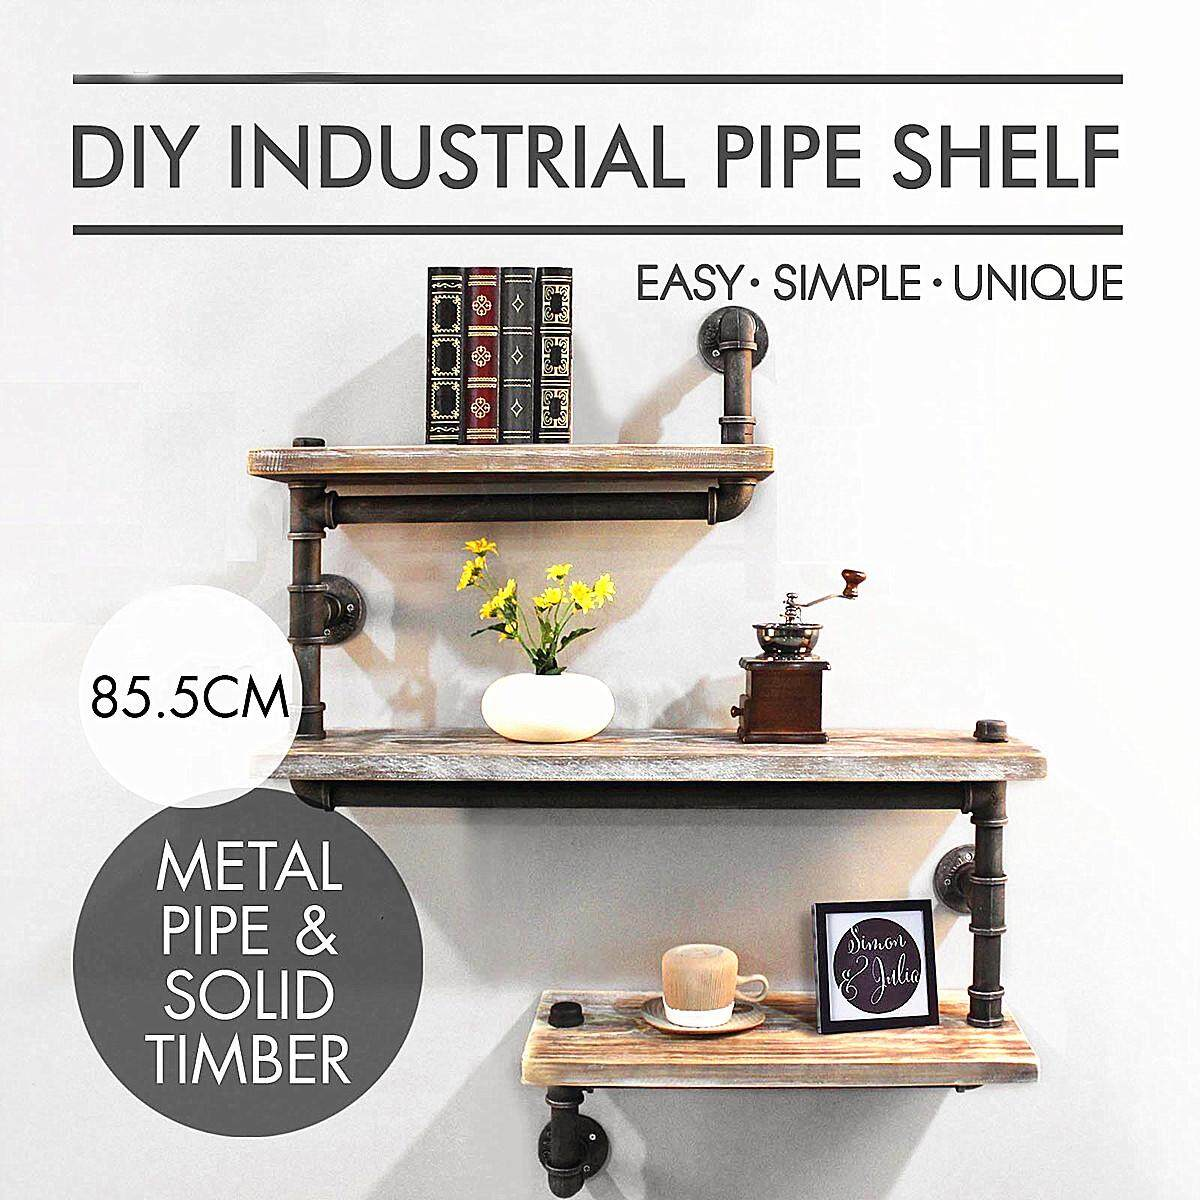 Industrial Pipe Wall Shelf Rustic Bookcase Storage Shelf Wood Shelving DIY 3 Tie